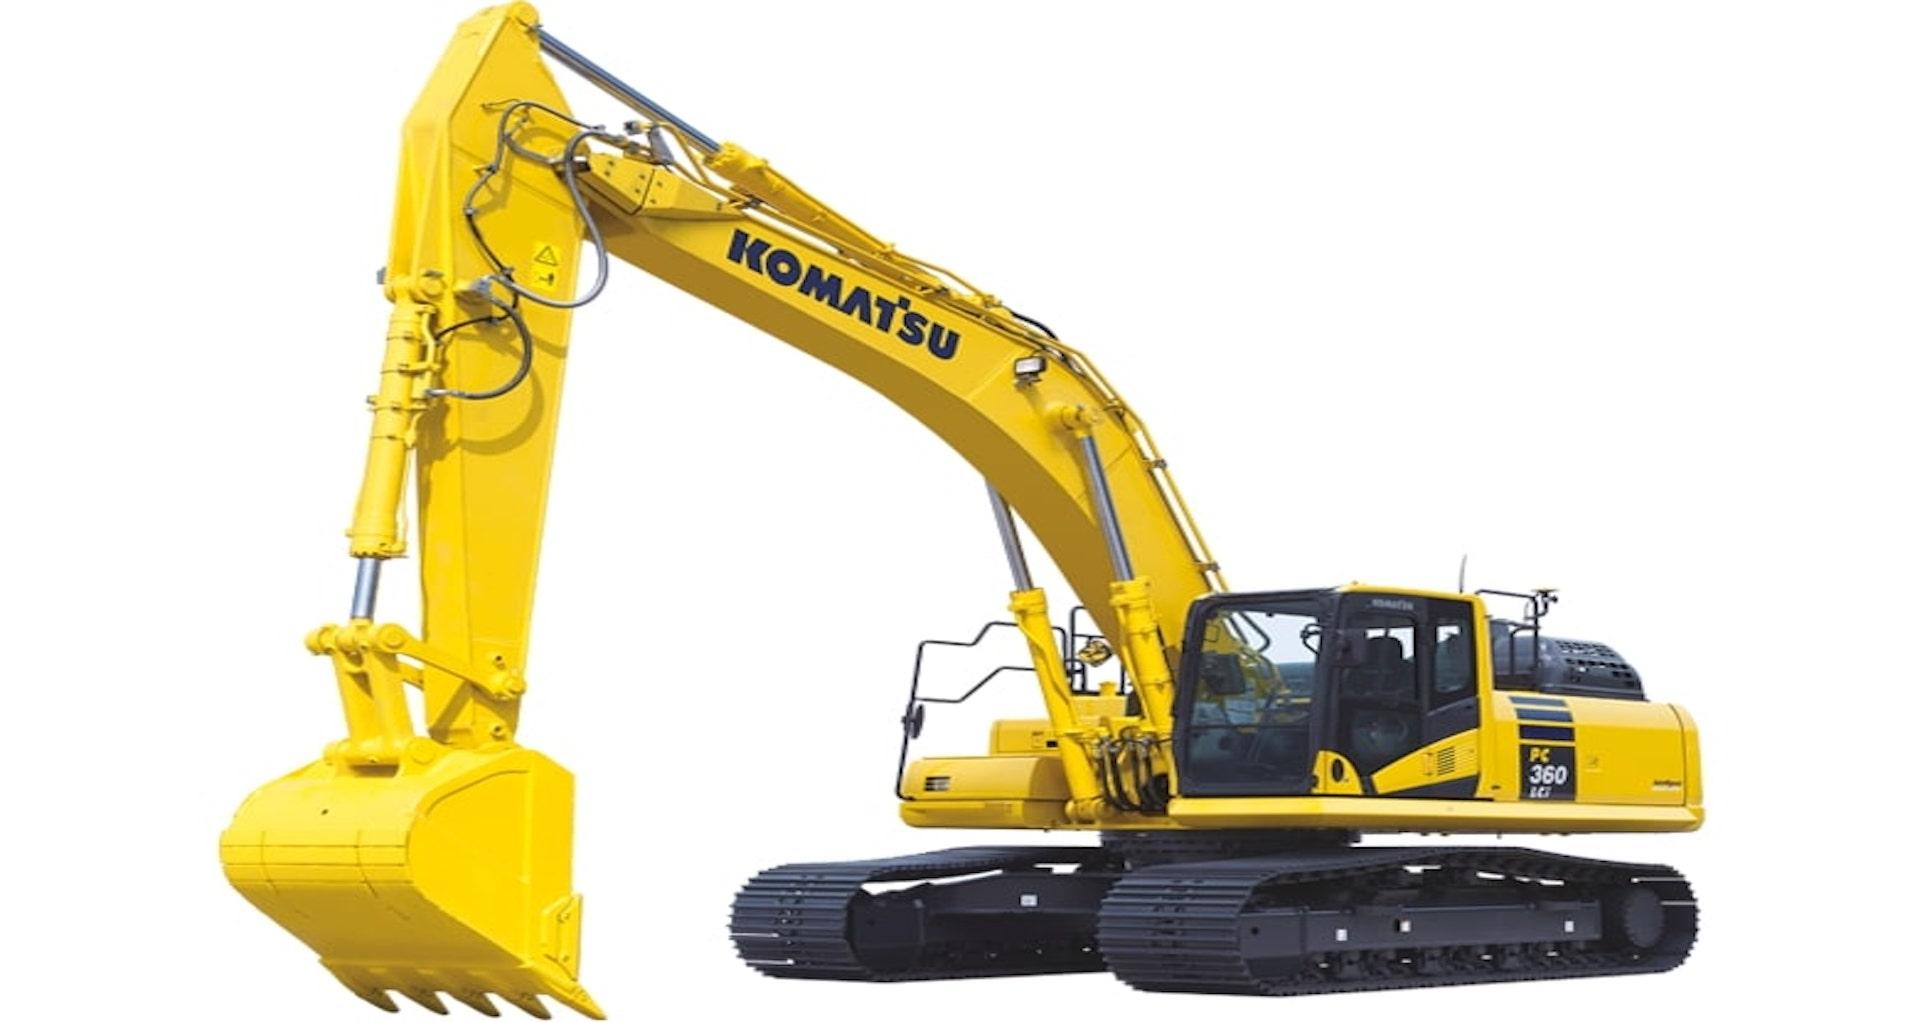 Escavatore cingolato intelligent Komatsu PC360LCi-11